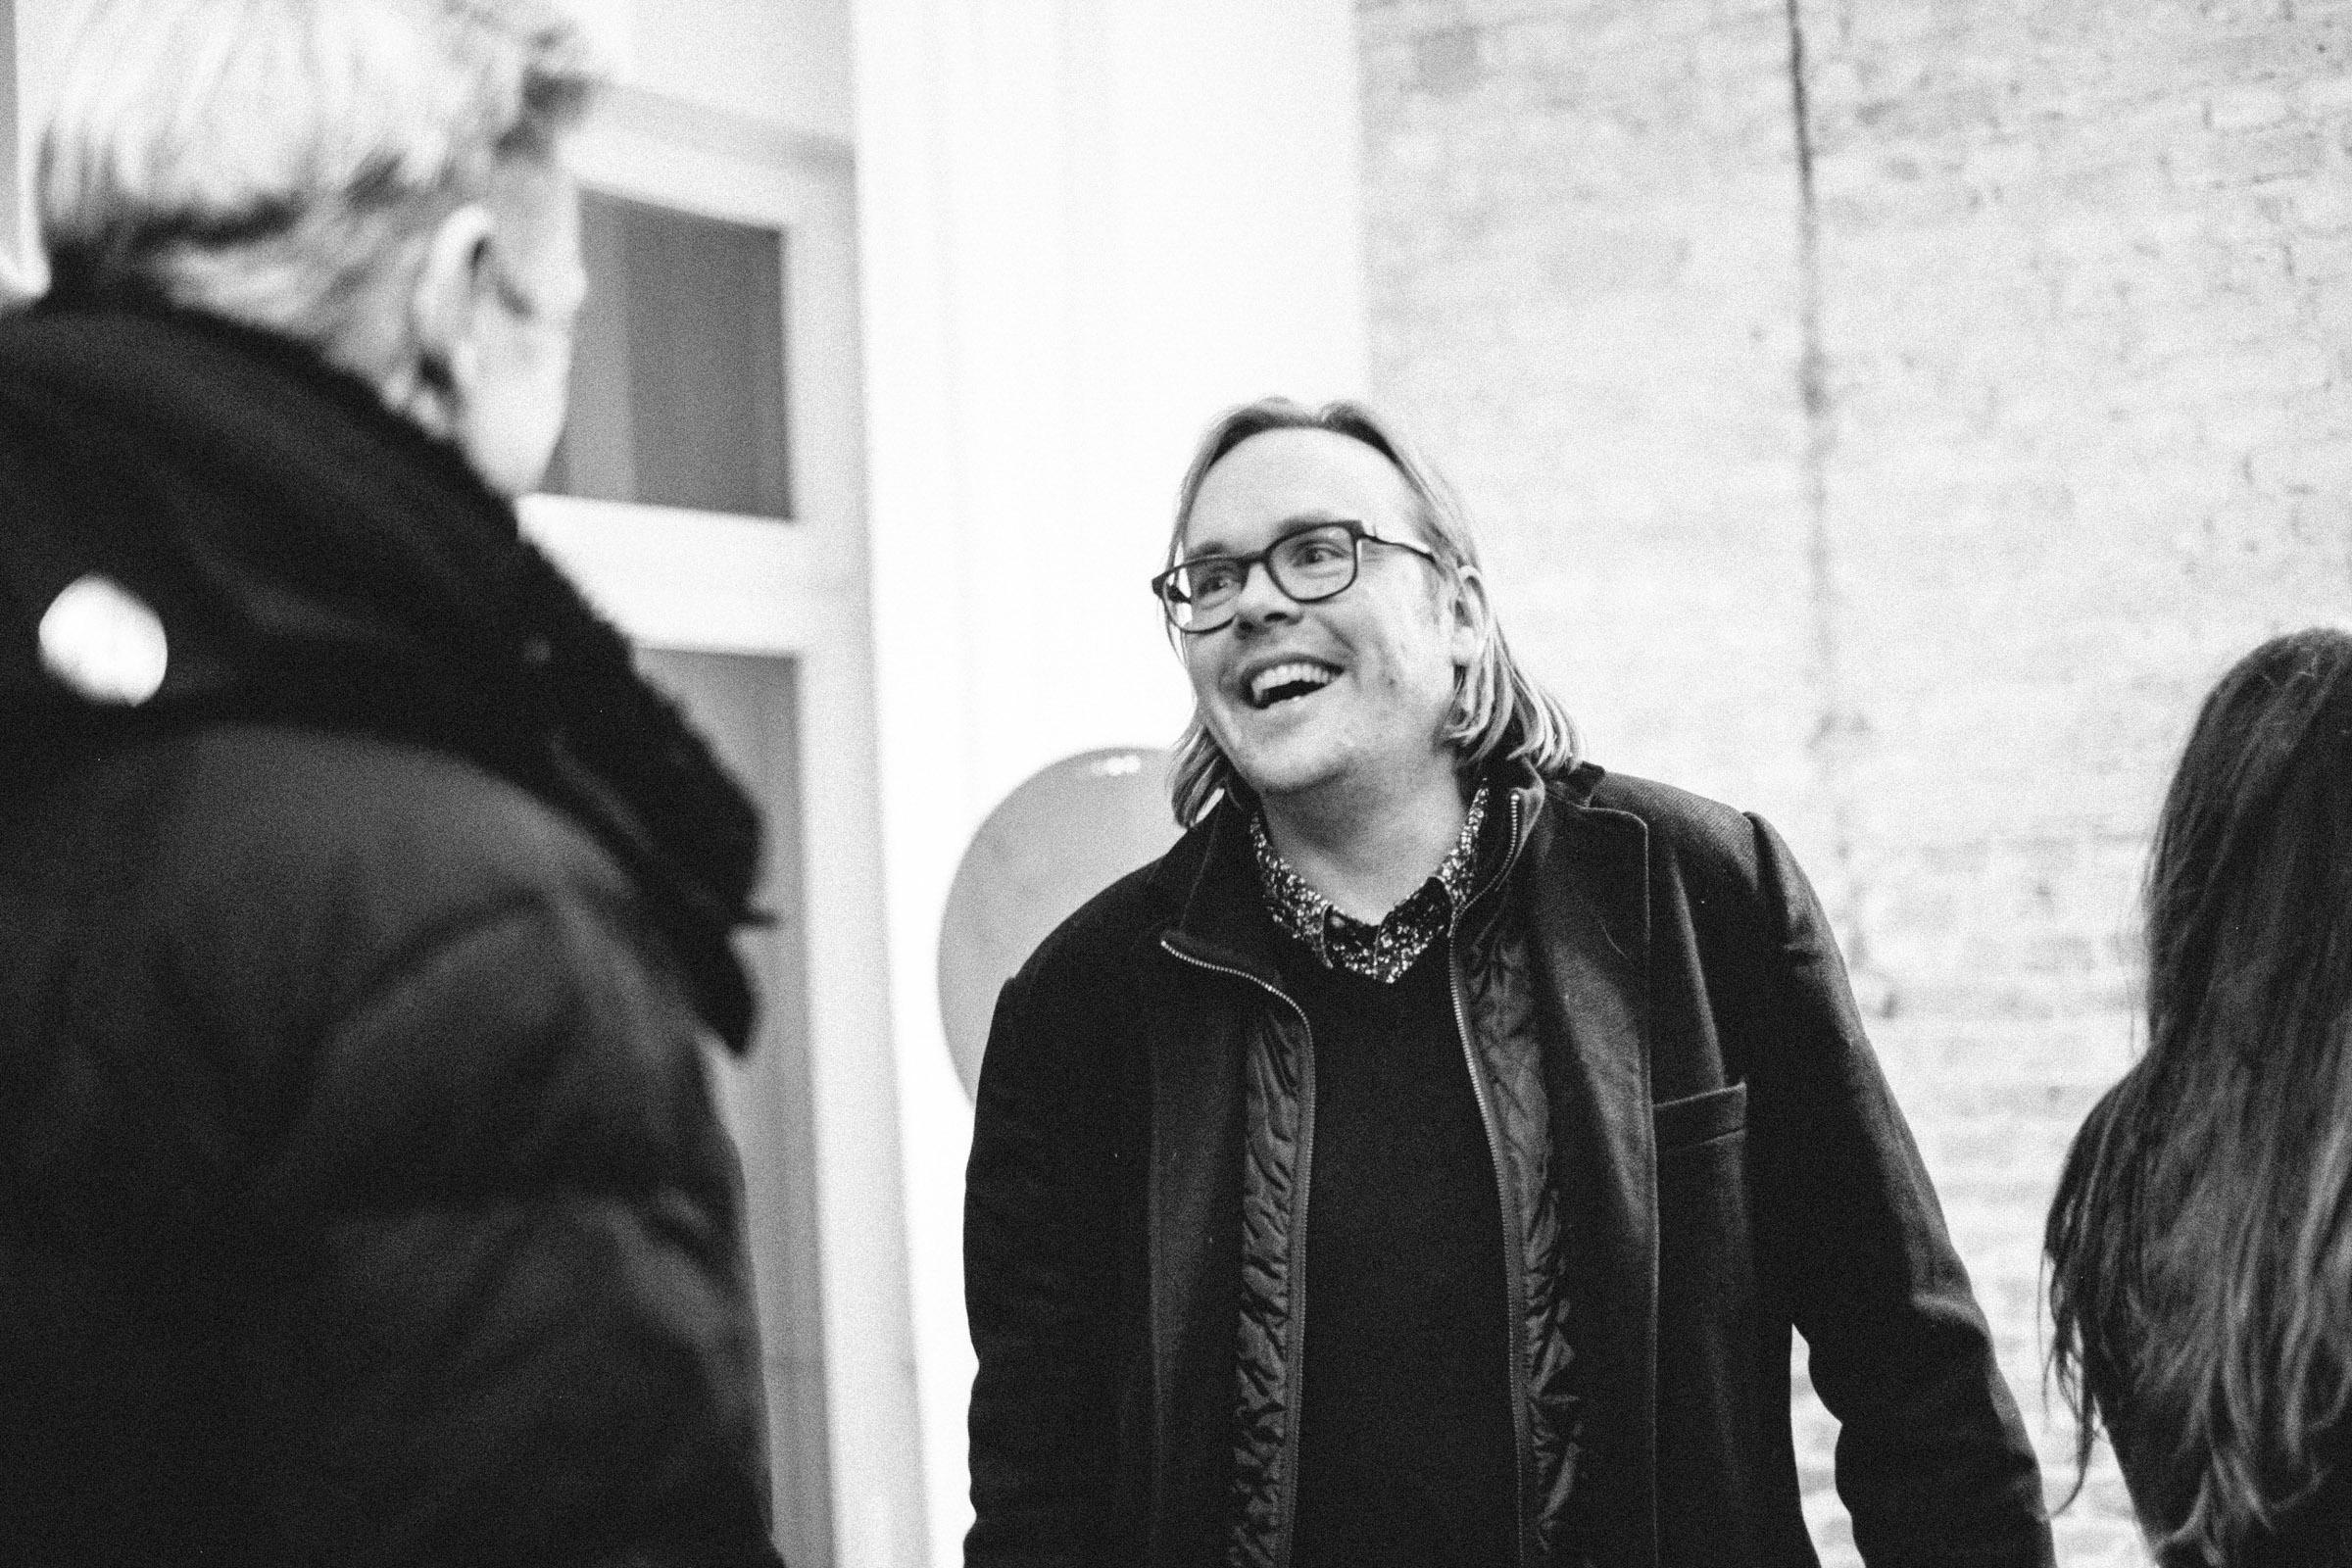 Fotograf Nils Hasenau auf der Eröffnungsfeier im Studio 23 Berlin